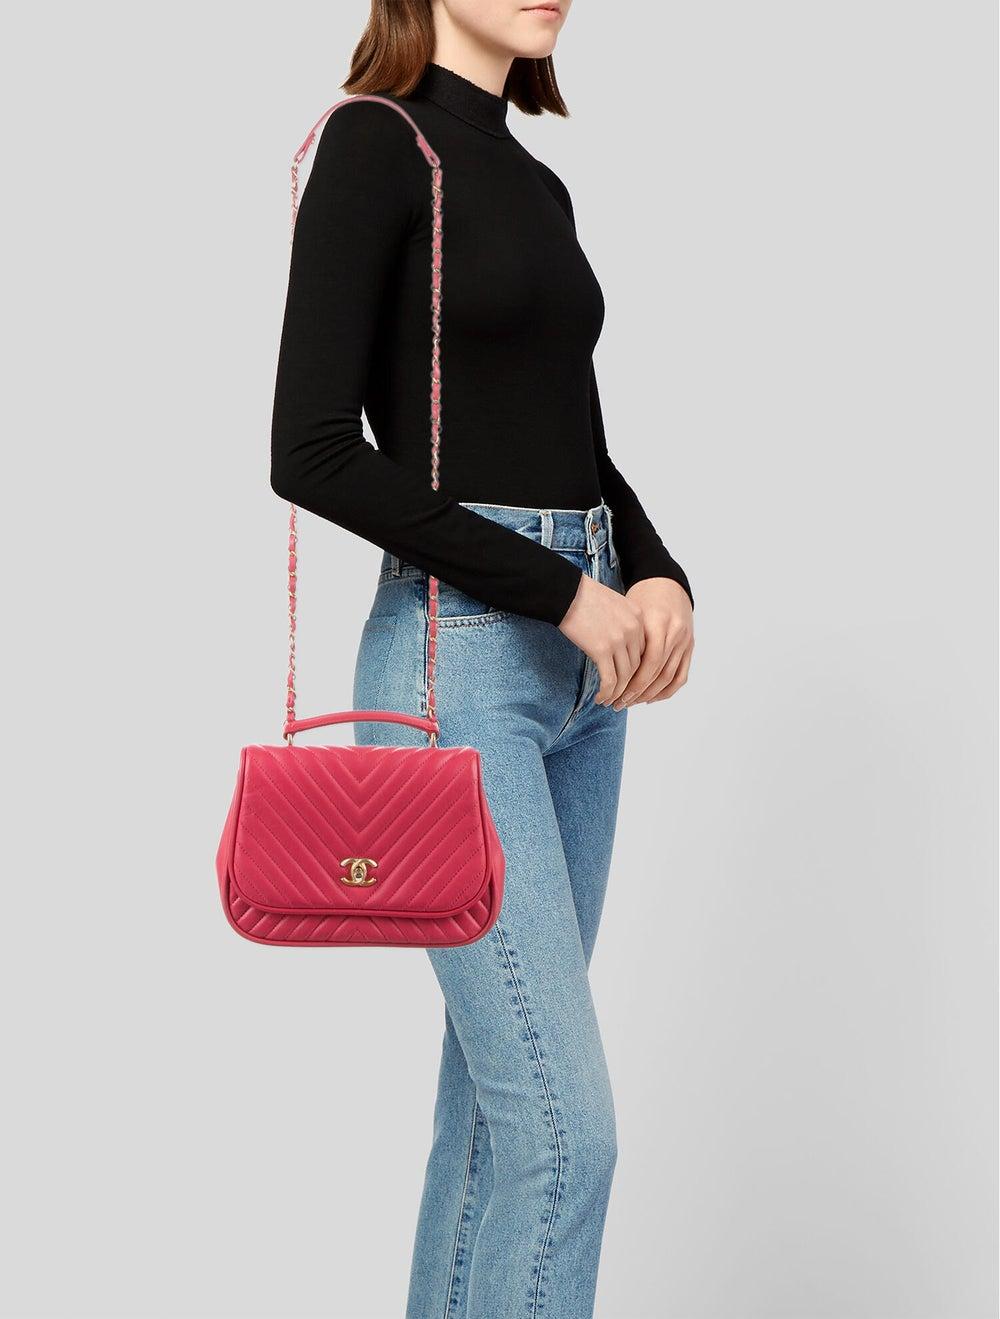 Chanel Reversed Chevron Bag Pink - image 2